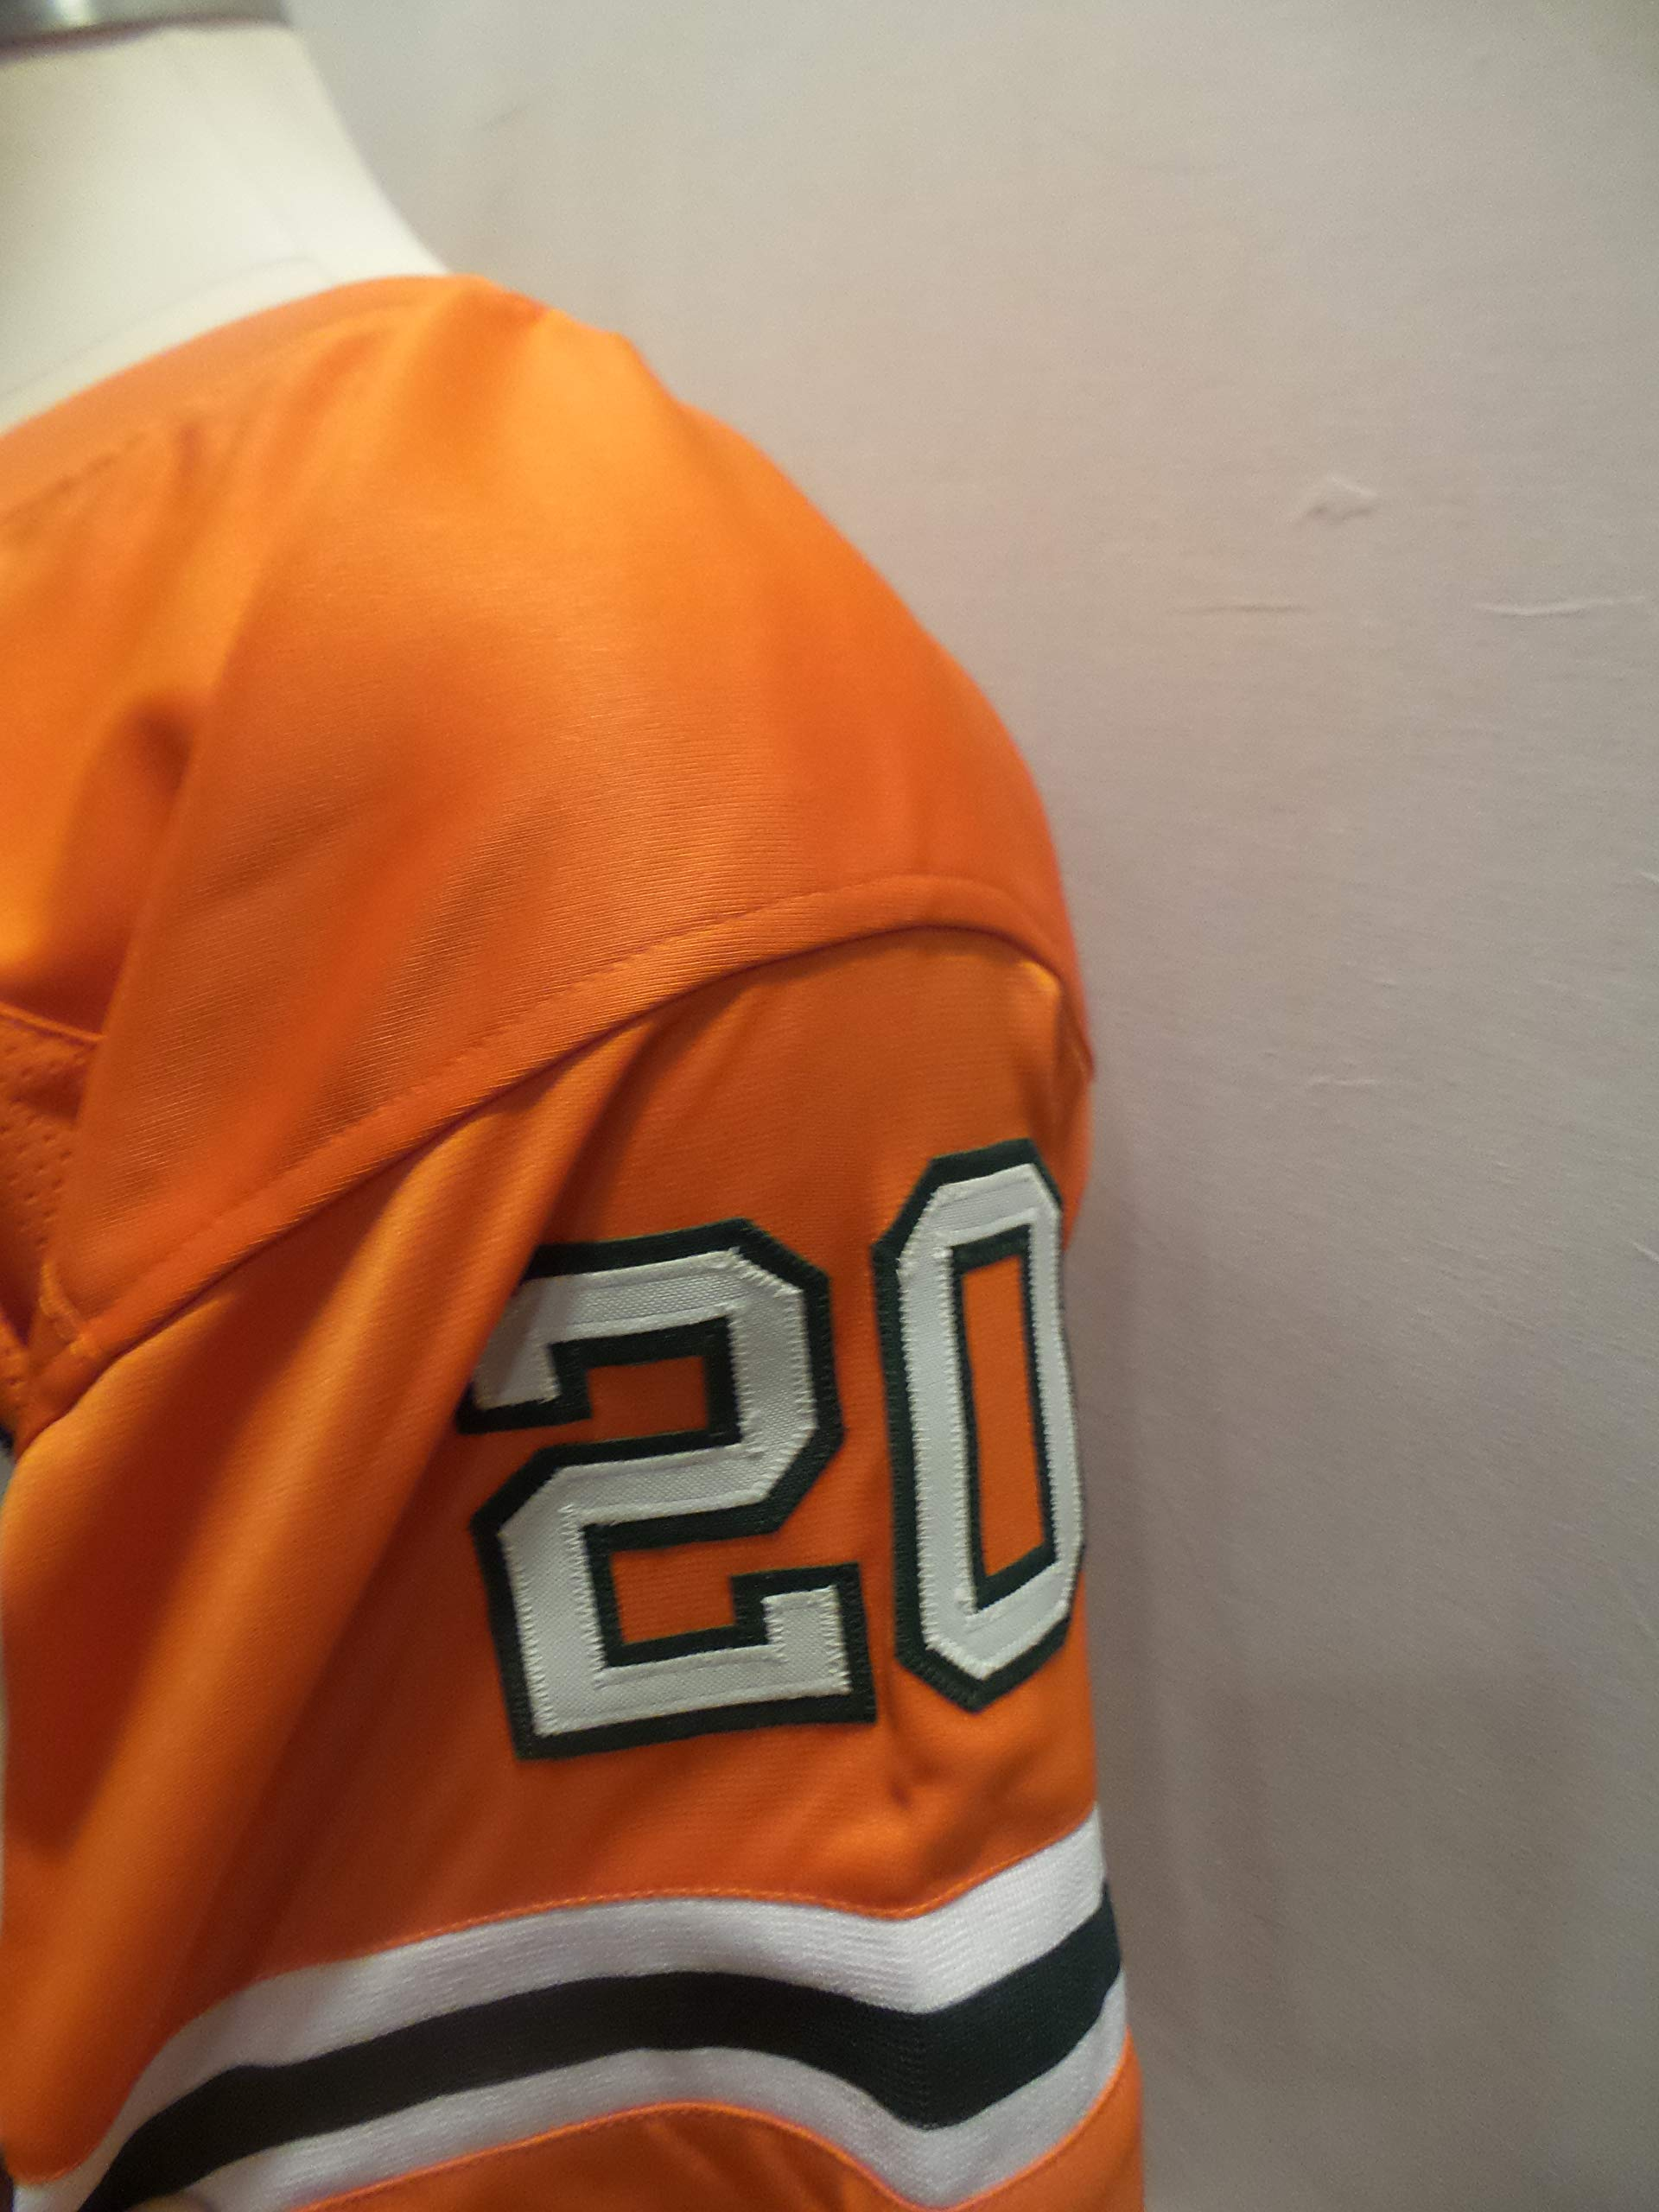 Ed Reed Signed Miami Hurricanes Orange Autographed Novelty Custom Jersey